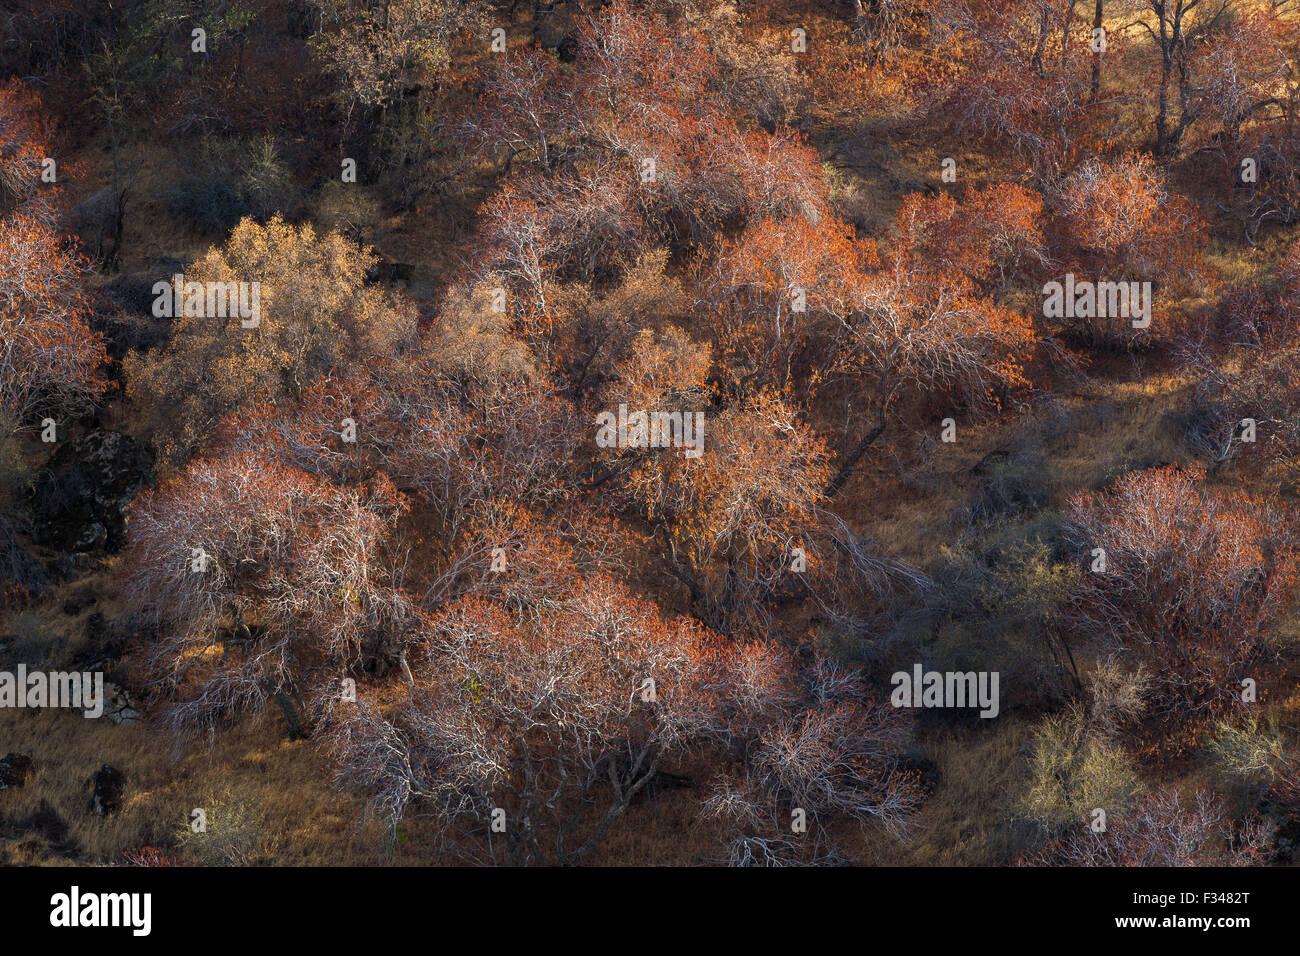 Buckeye Bäume fangen spätere am Nachmittag Licht, Sequoia Nationalpark, Kalifornien, USA Stockfoto